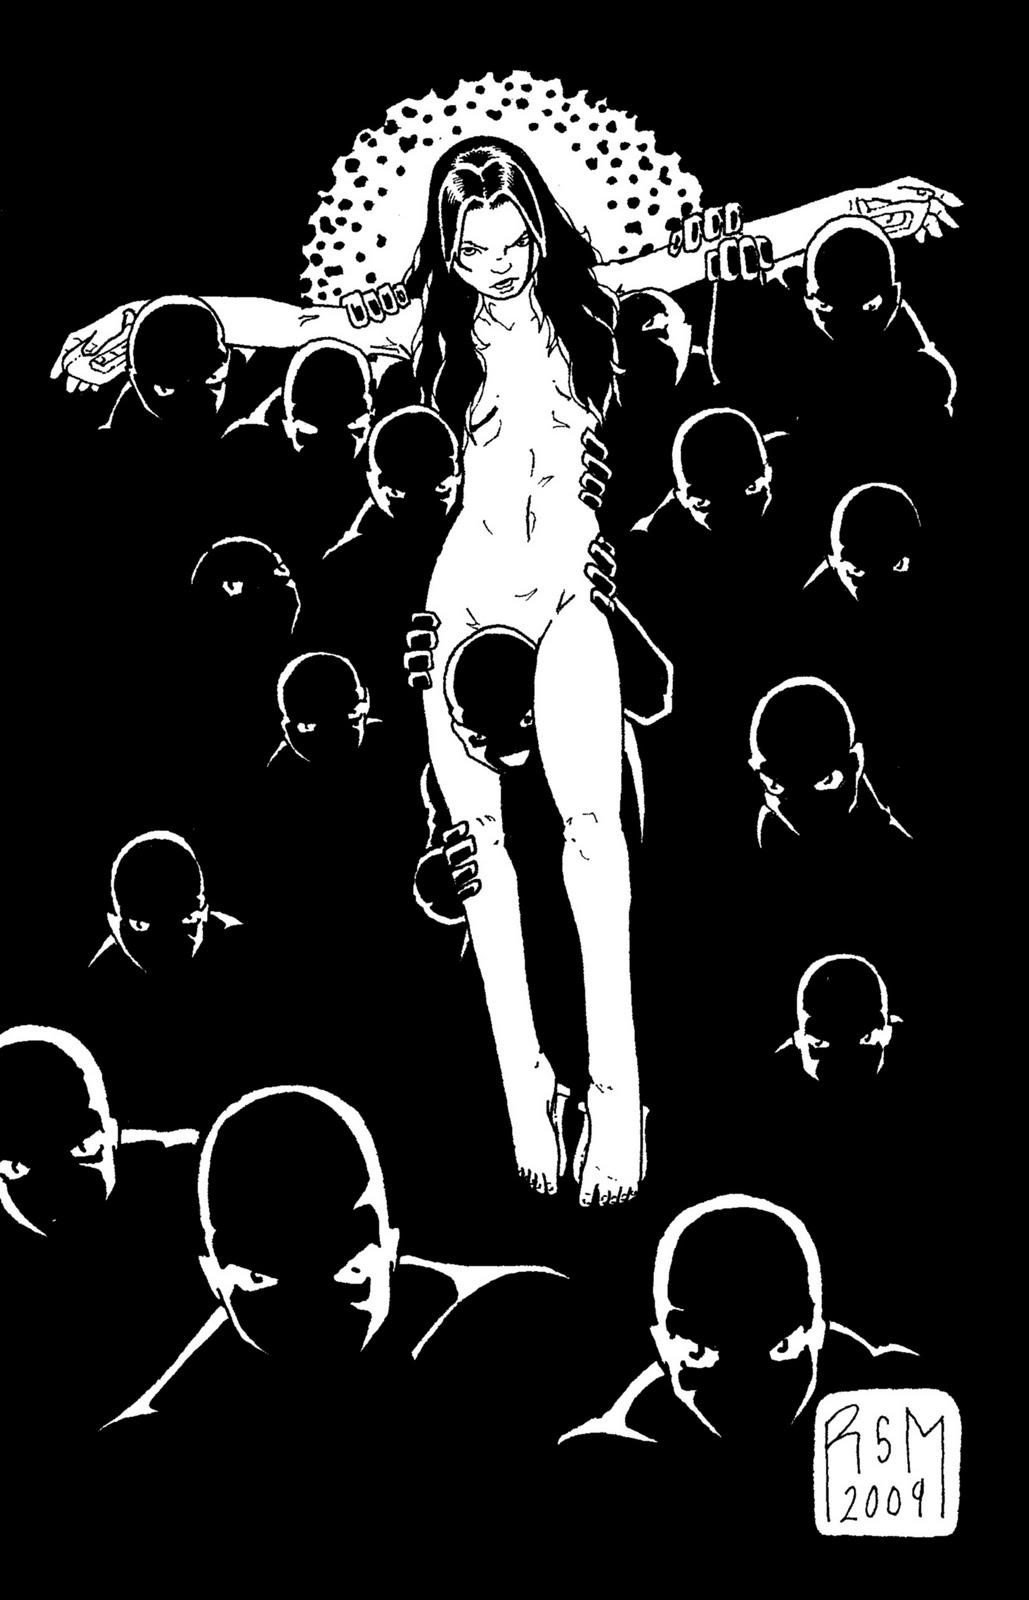 La+mujer+herrada.jpg